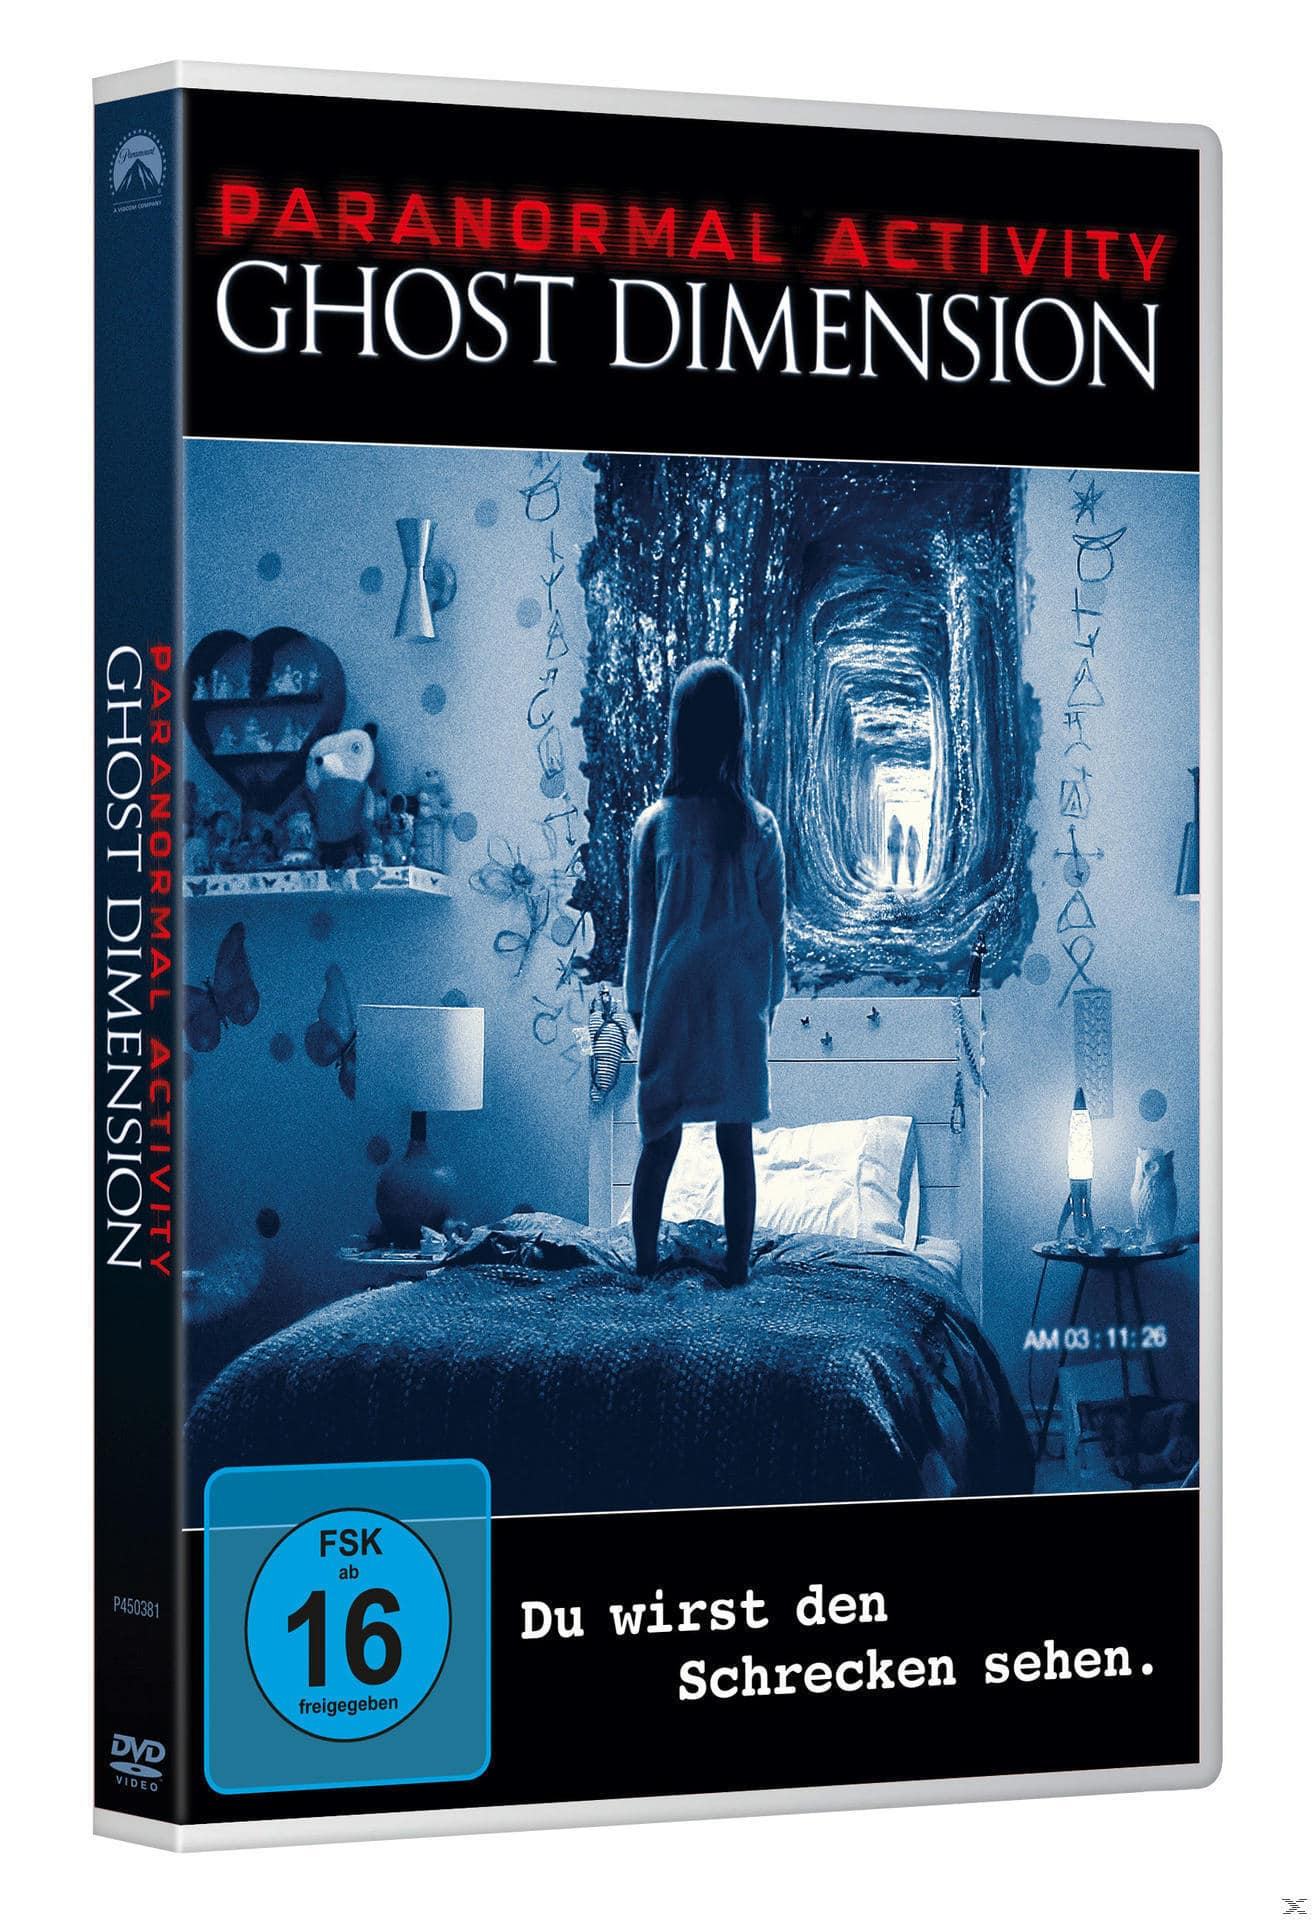 Paranormal Activity: The Ghost Dimension (DVD) für 8,99 Euro